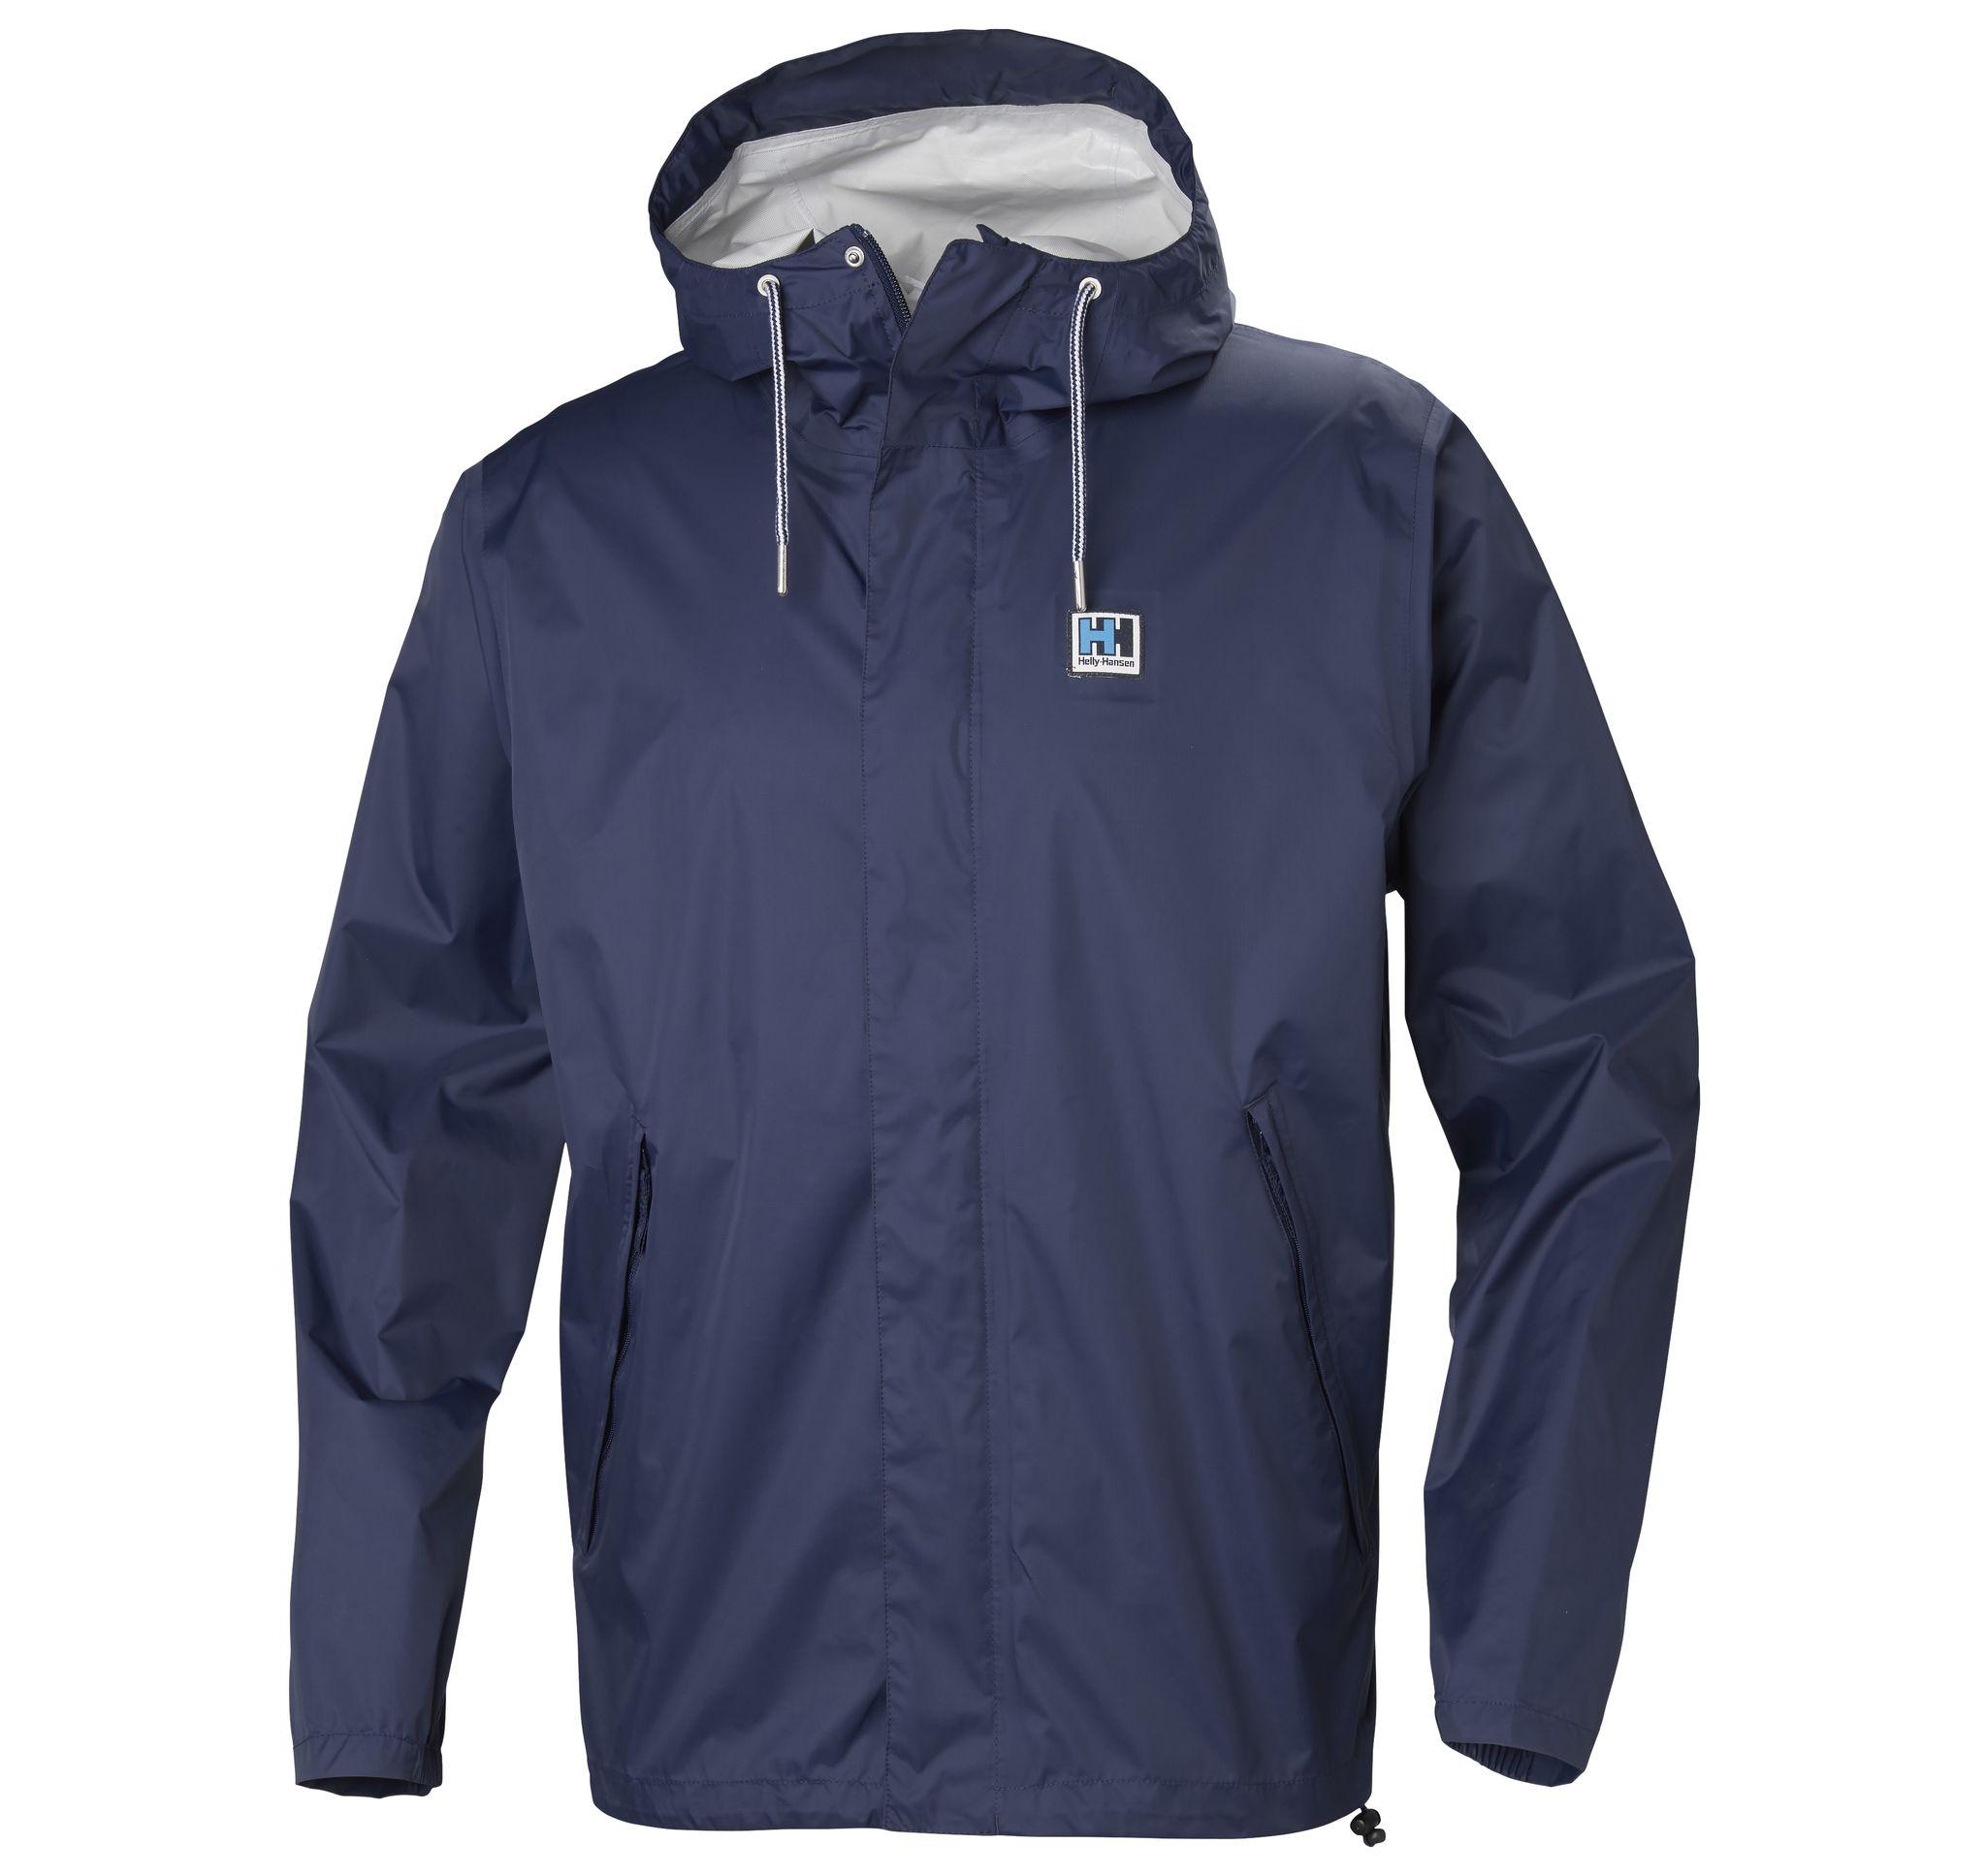 hh mountain jacket, 689 evening blue, l, regnjackor